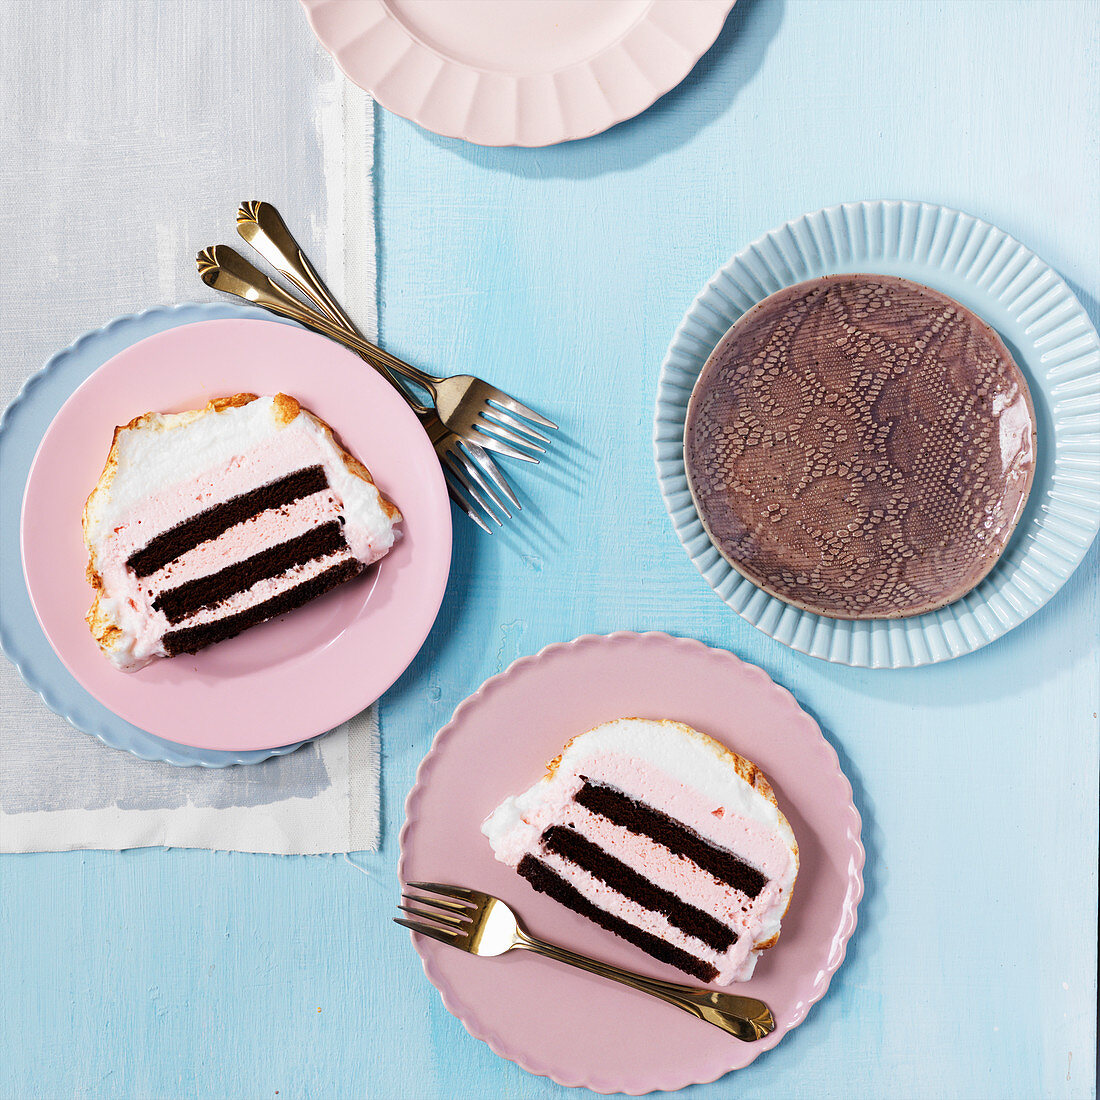 Slices of Baked Alaska Cake